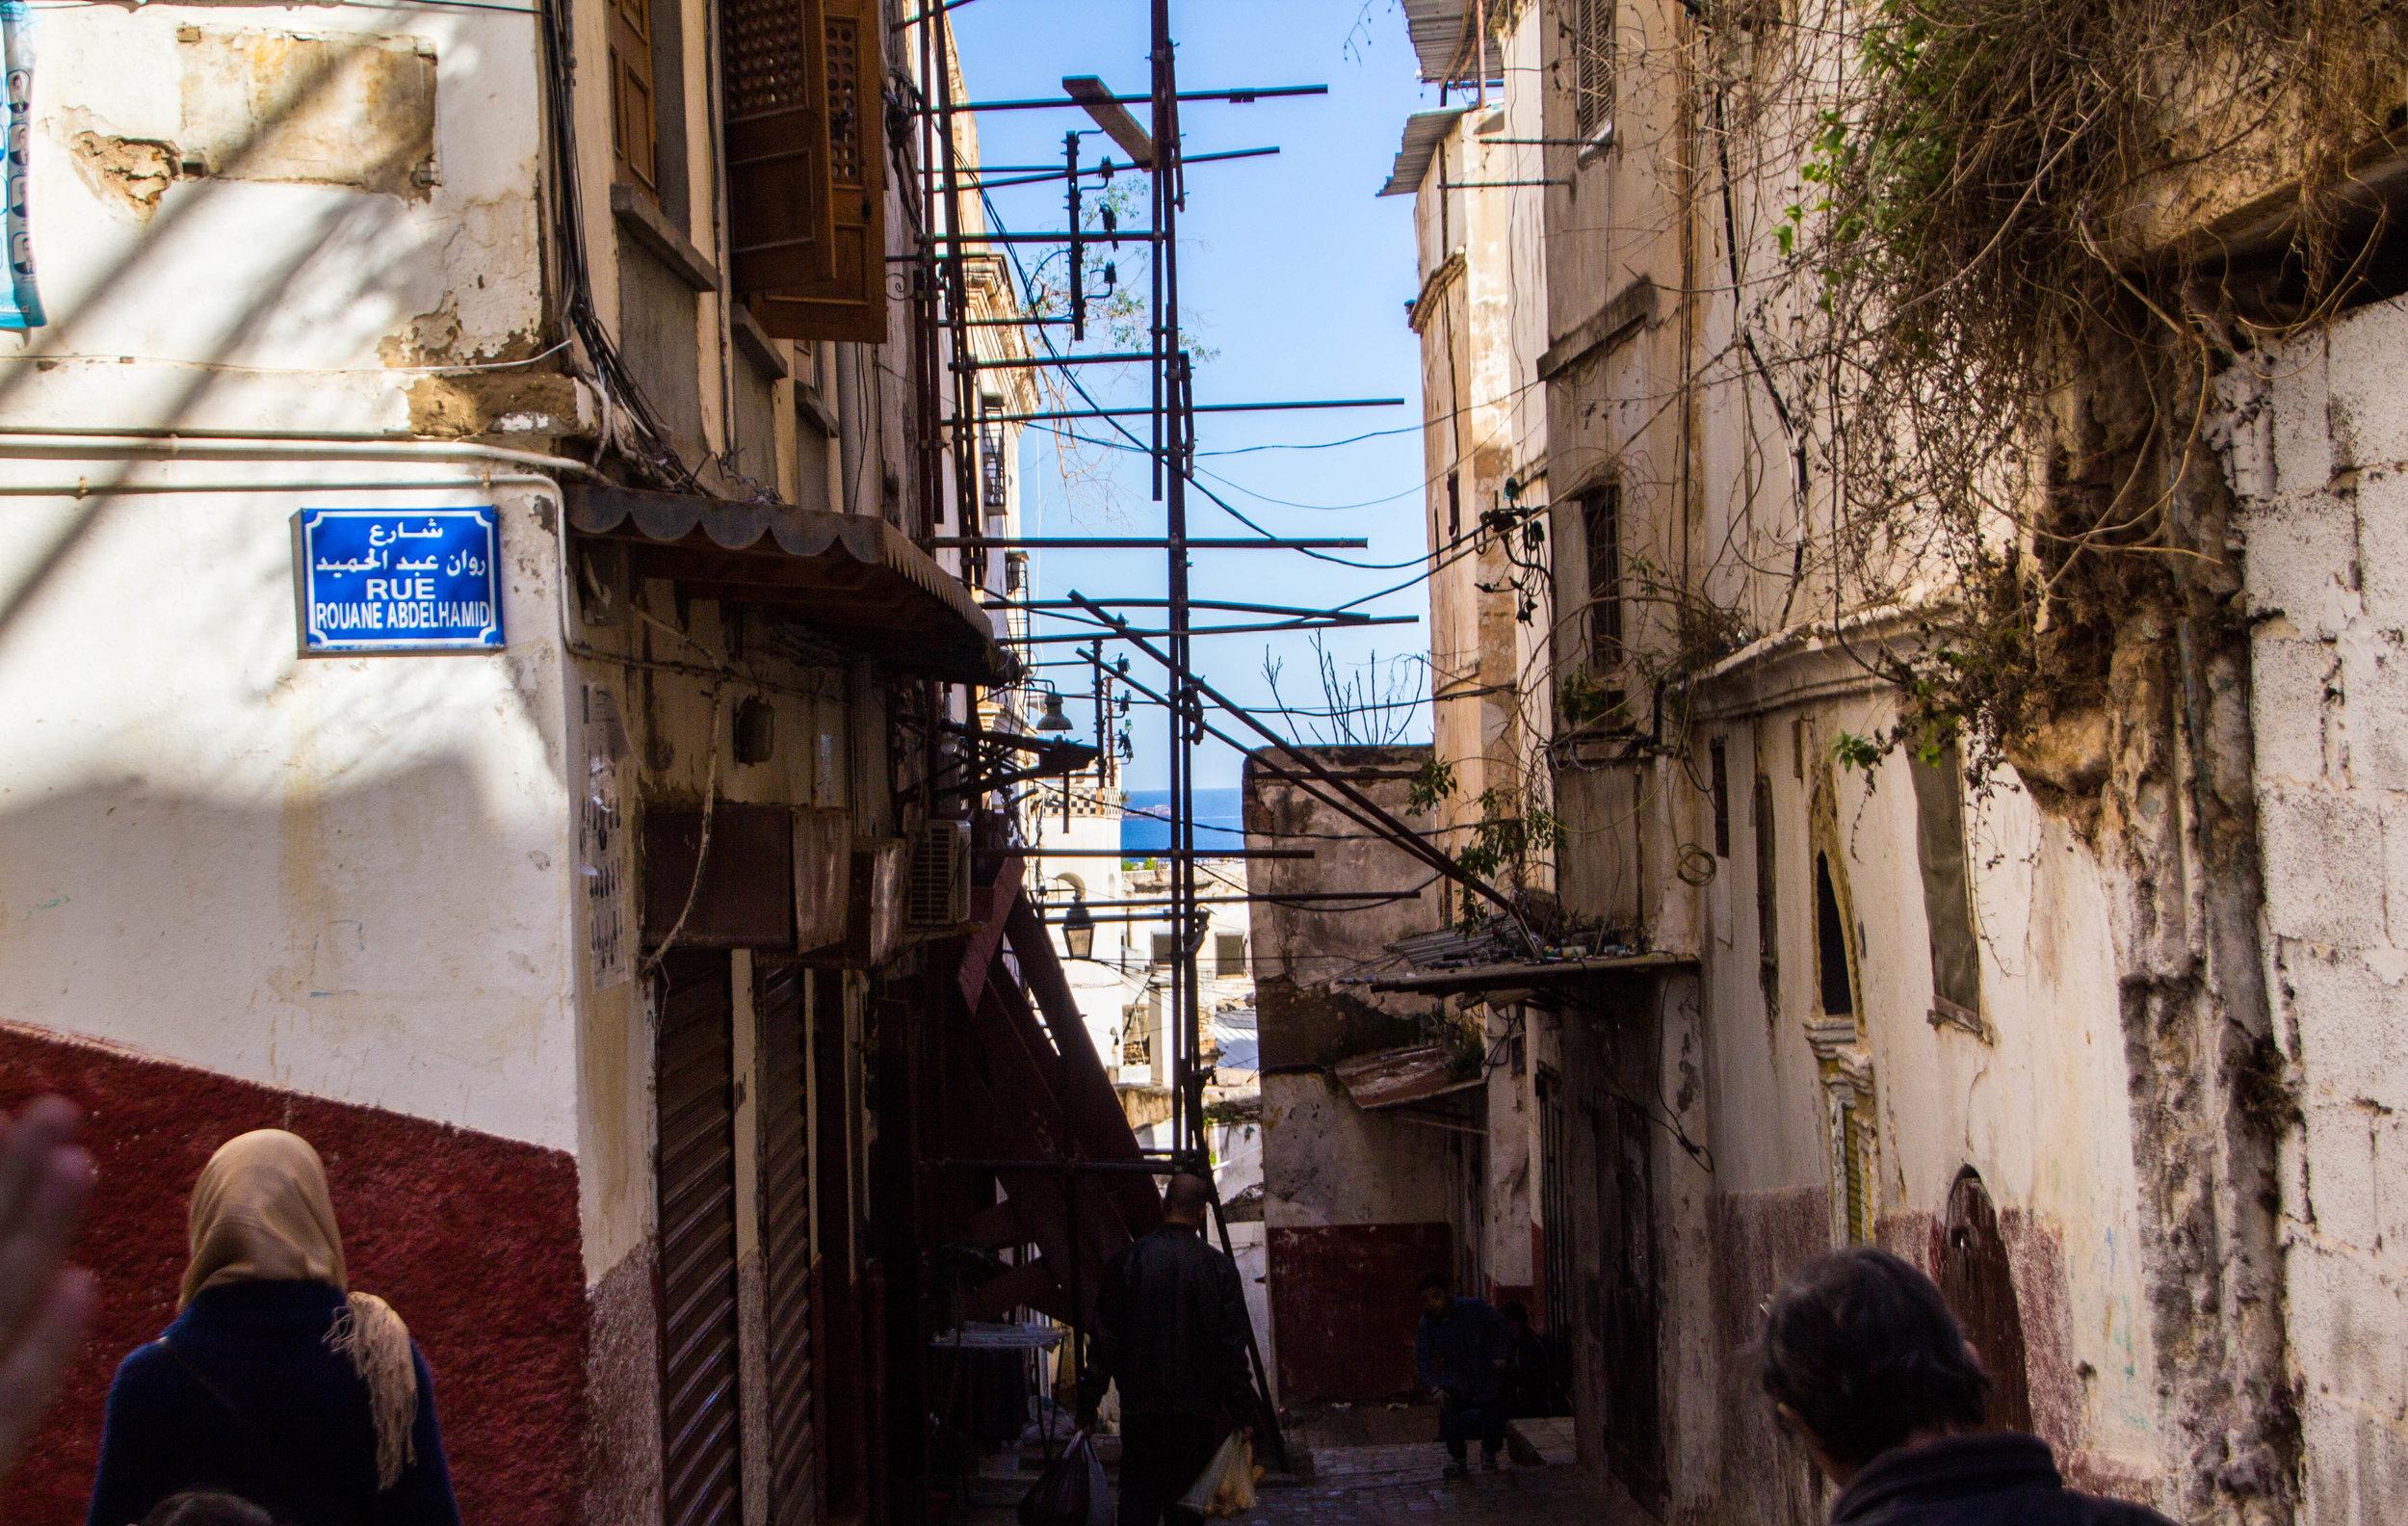 casbah-photography-algiers-algeria-alger-10.jpg